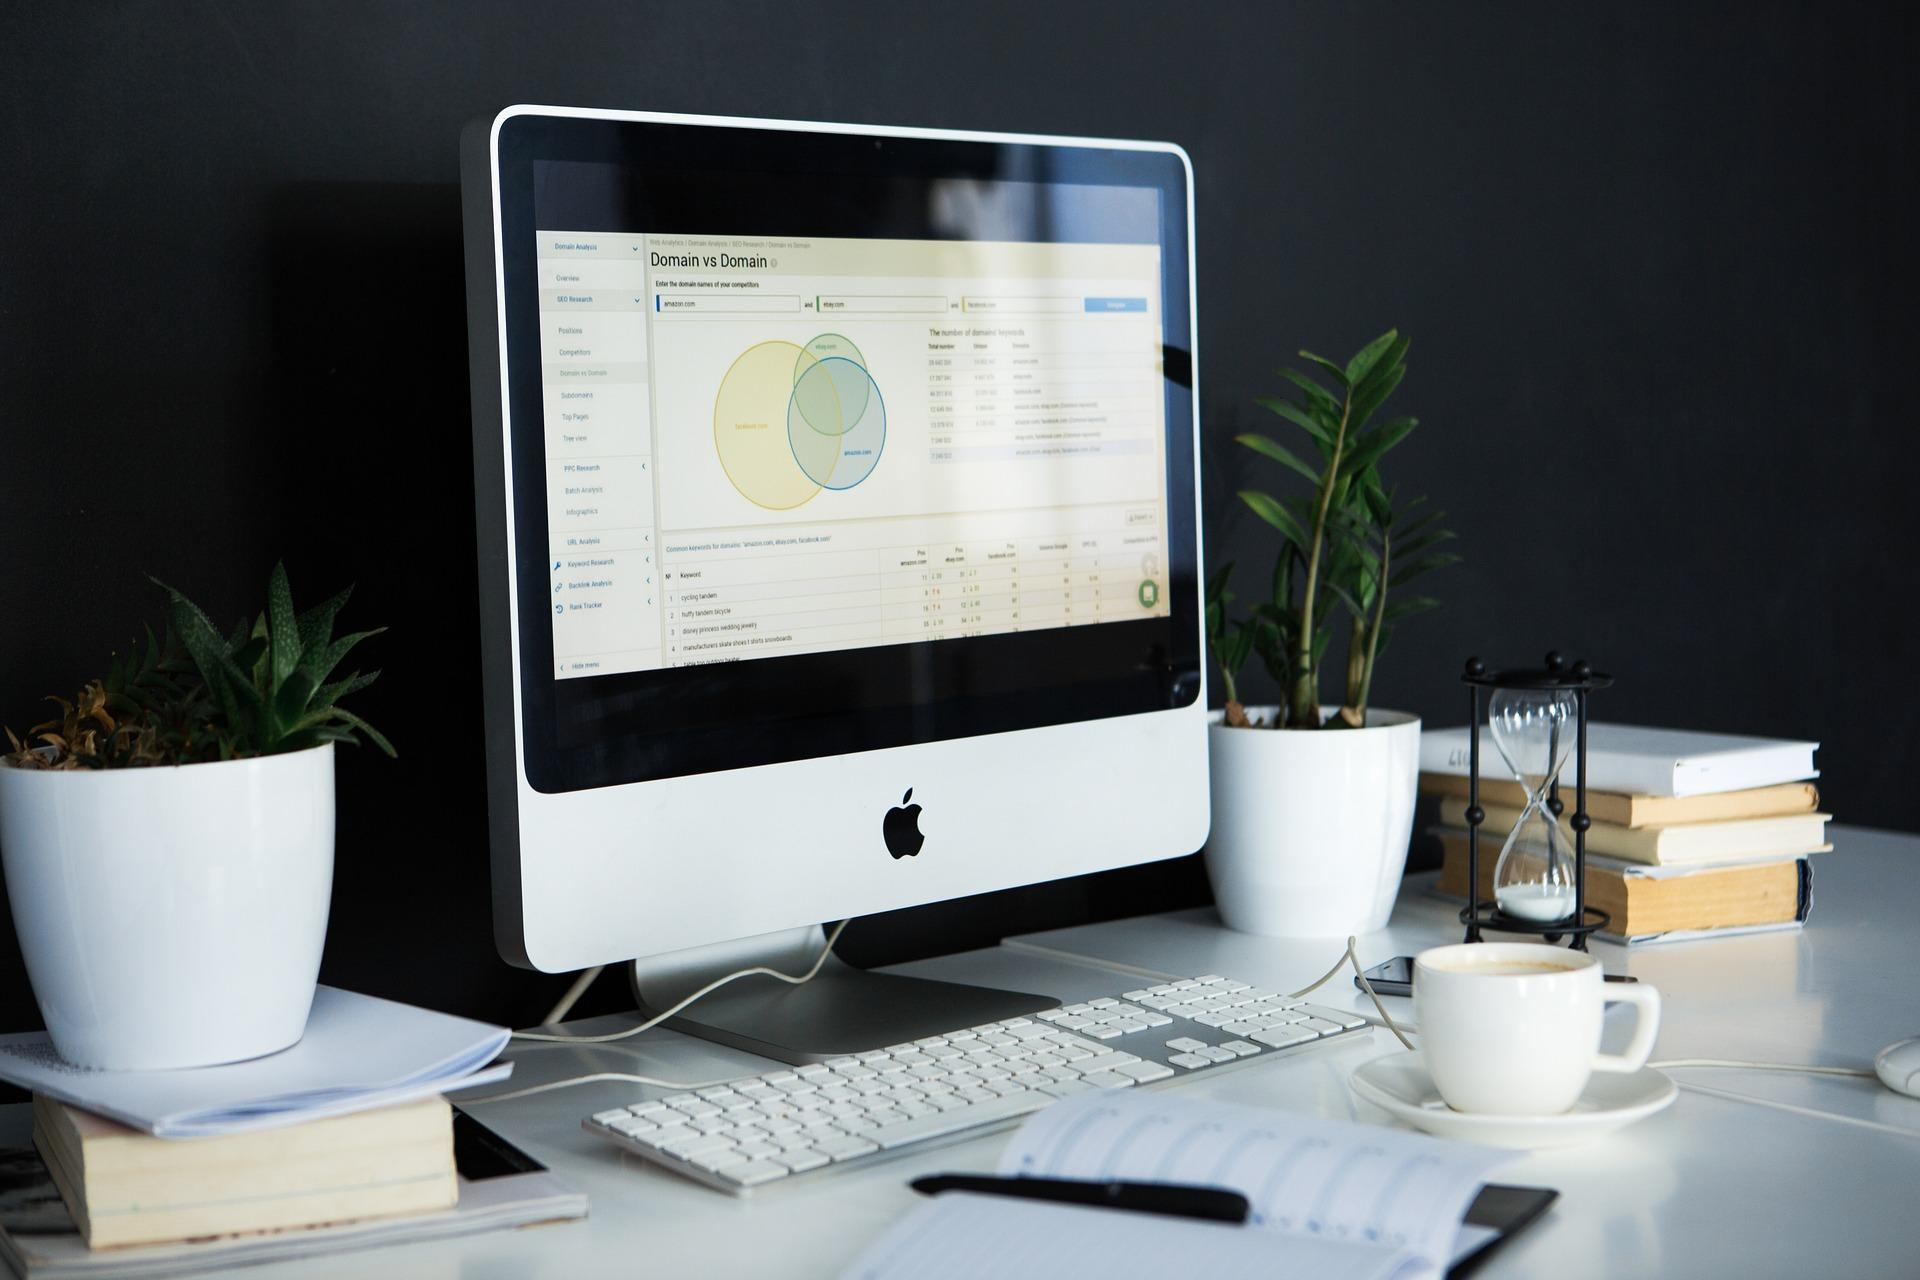 Tendencias de Marketing Digital para 2019